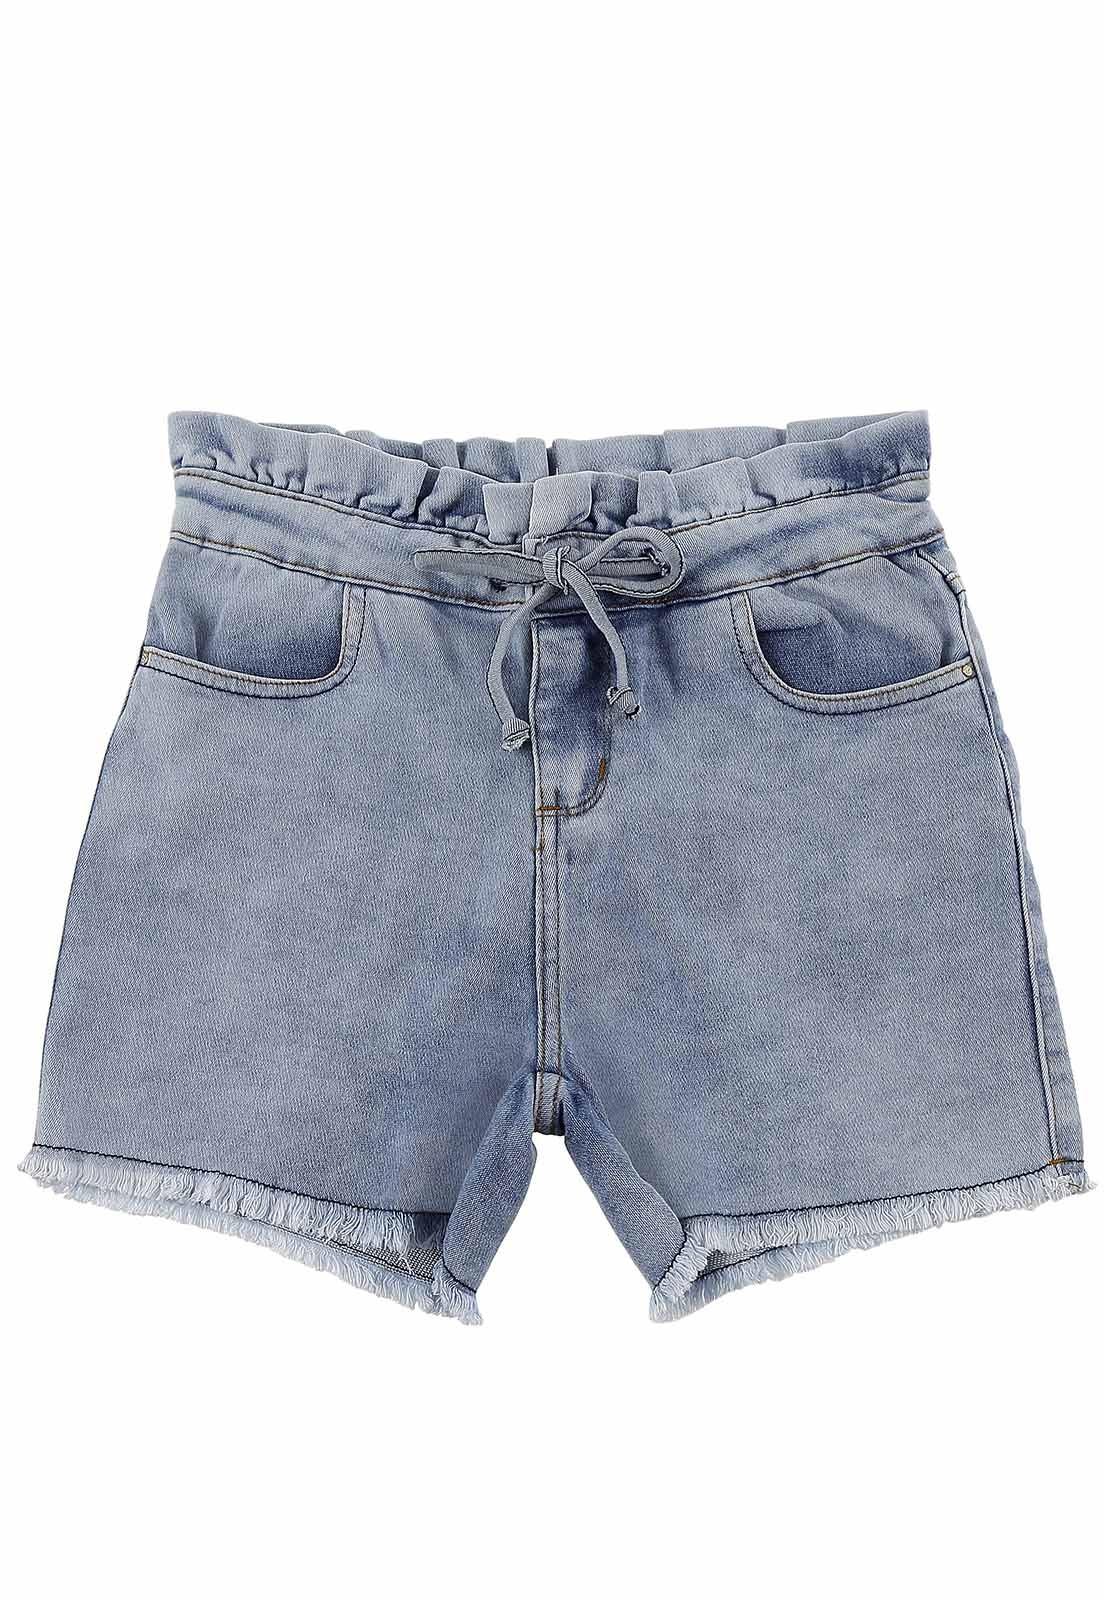 Short Crawling Jeans Clochard